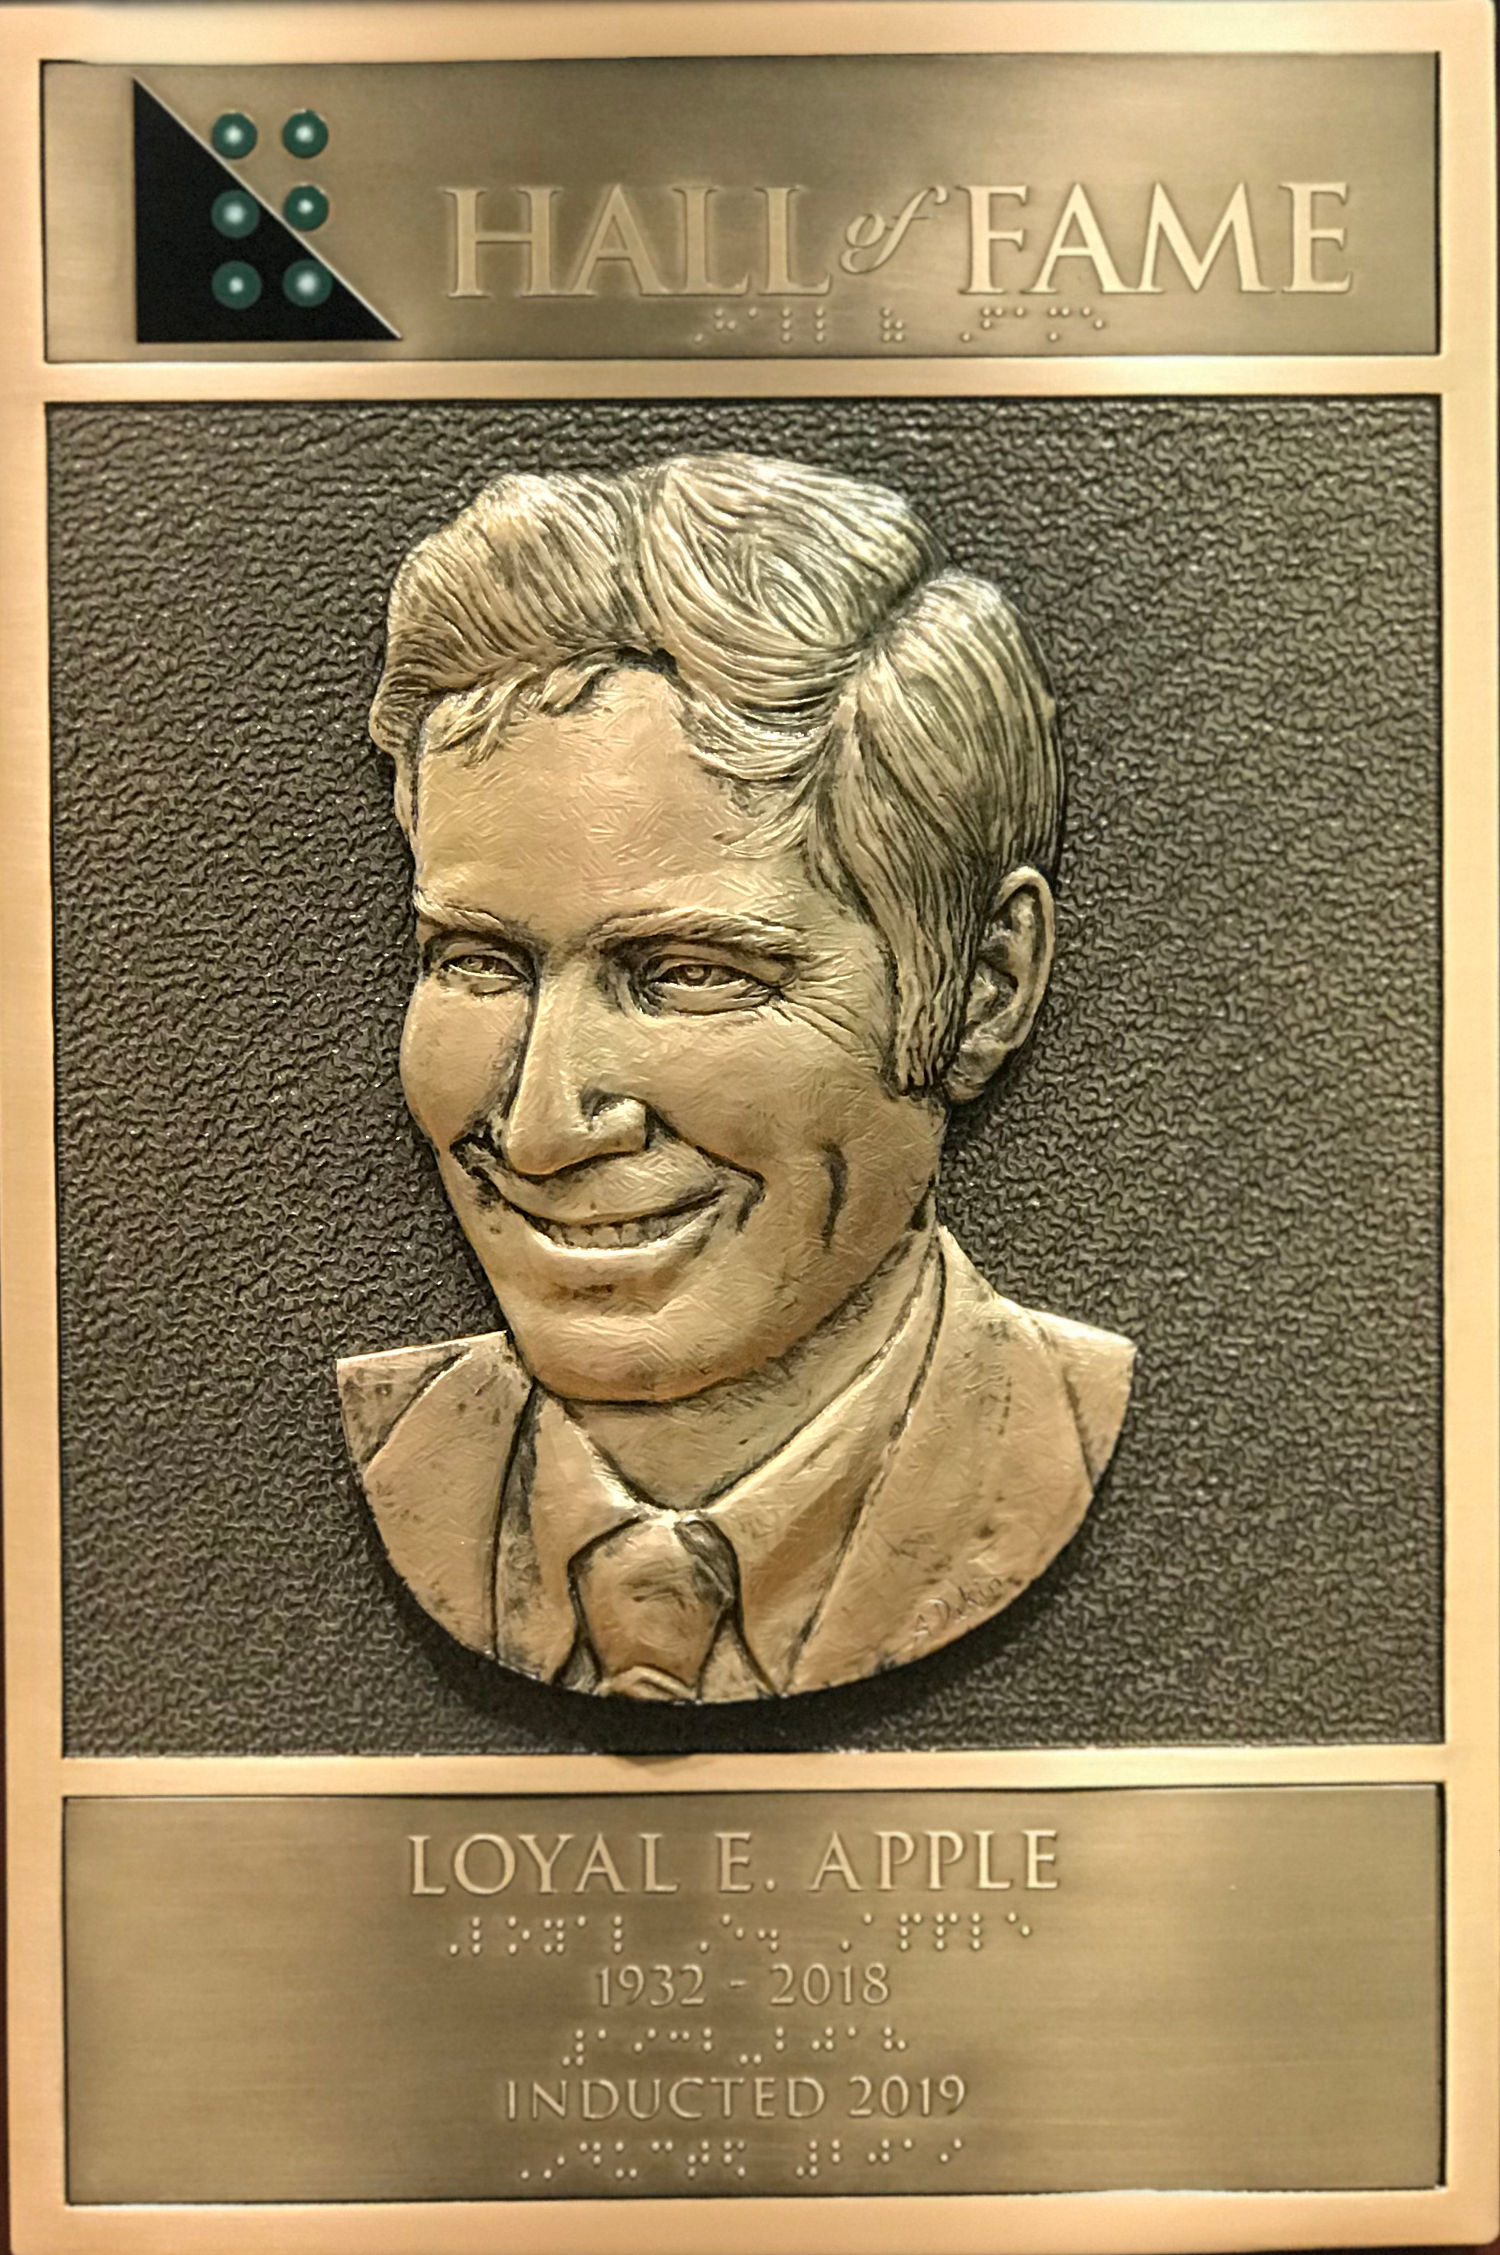 Loyal Eugene Apple's Hall of Fame Plaque